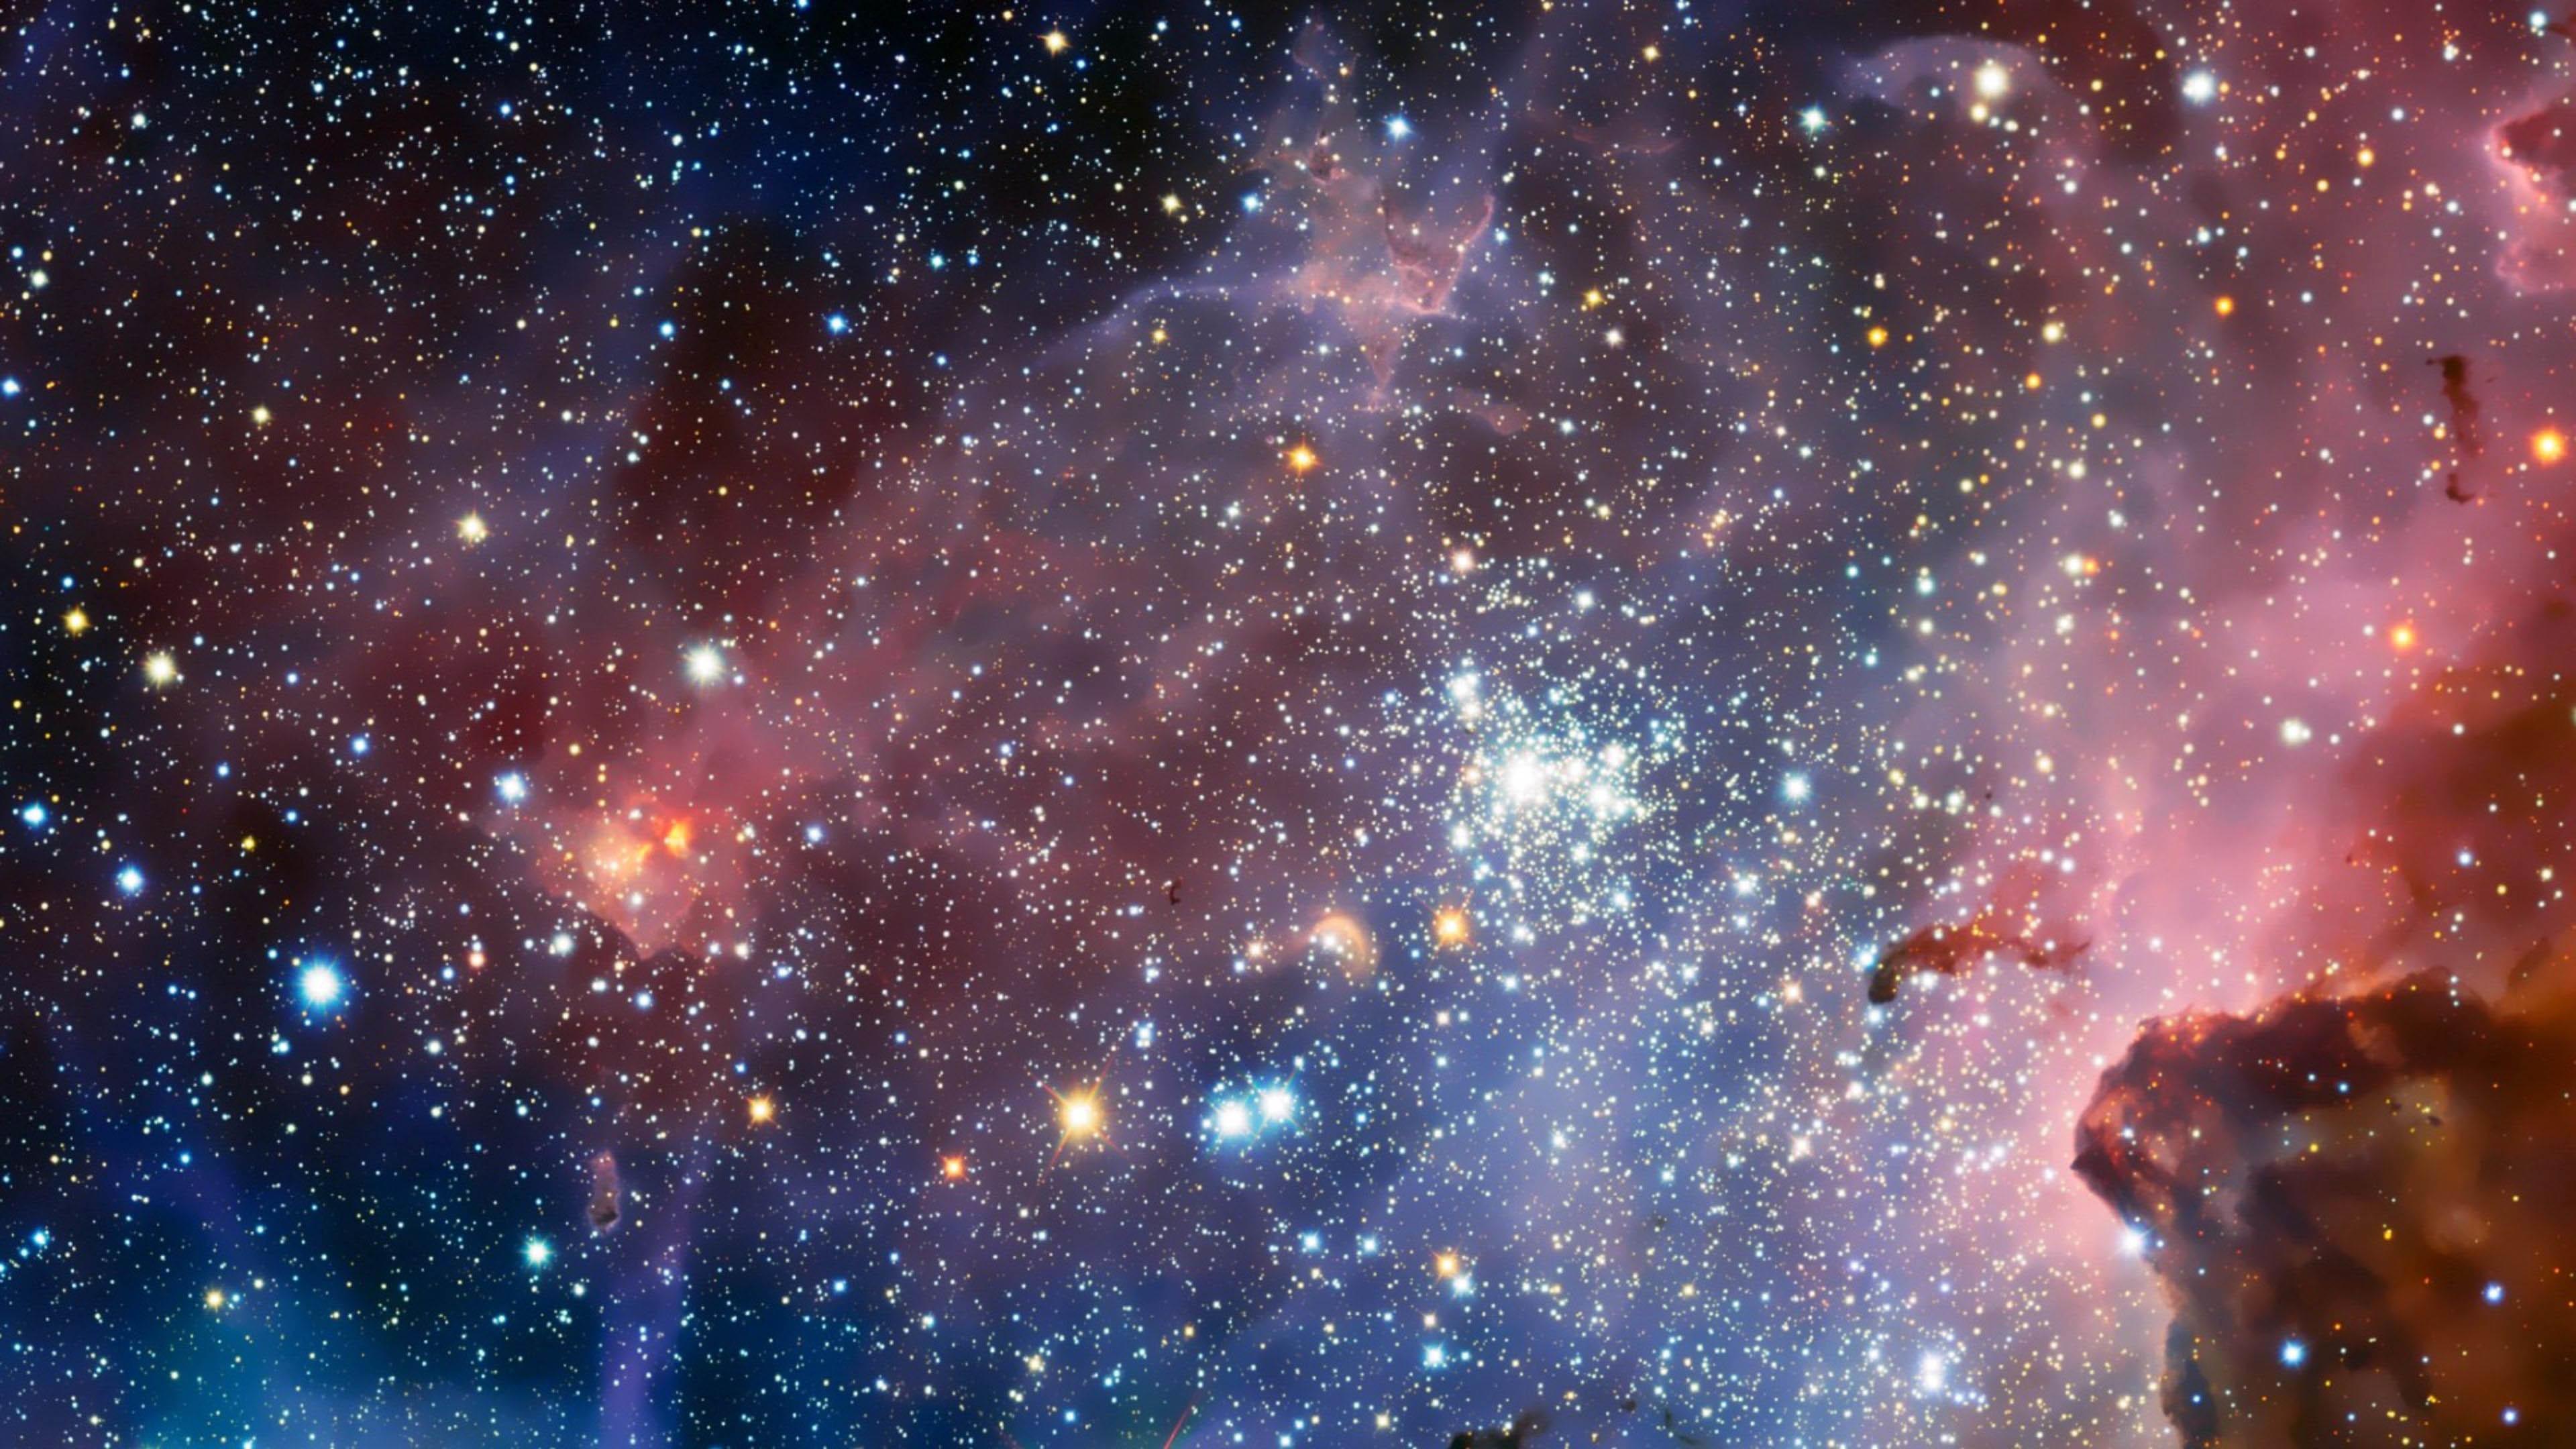 Constellations Space Wallpaper wallpaper